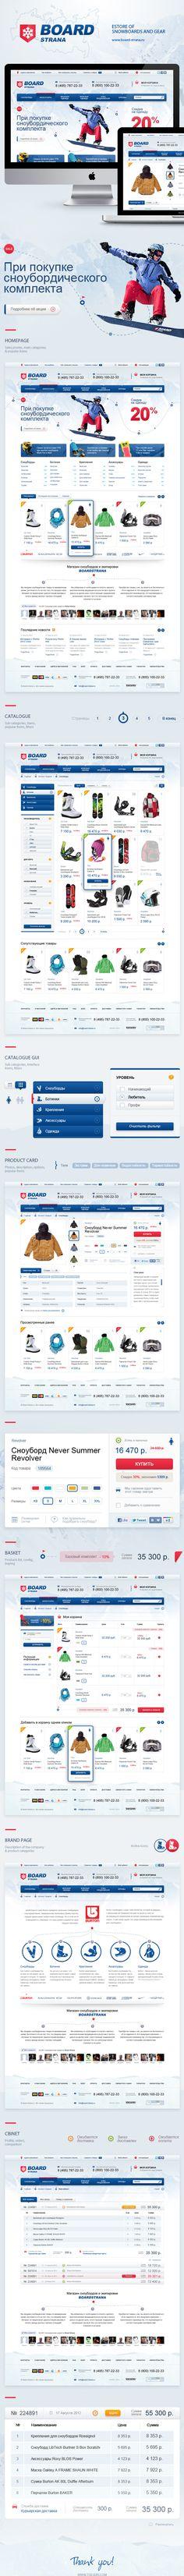 Board-strana.ru by tdeser , via Behance